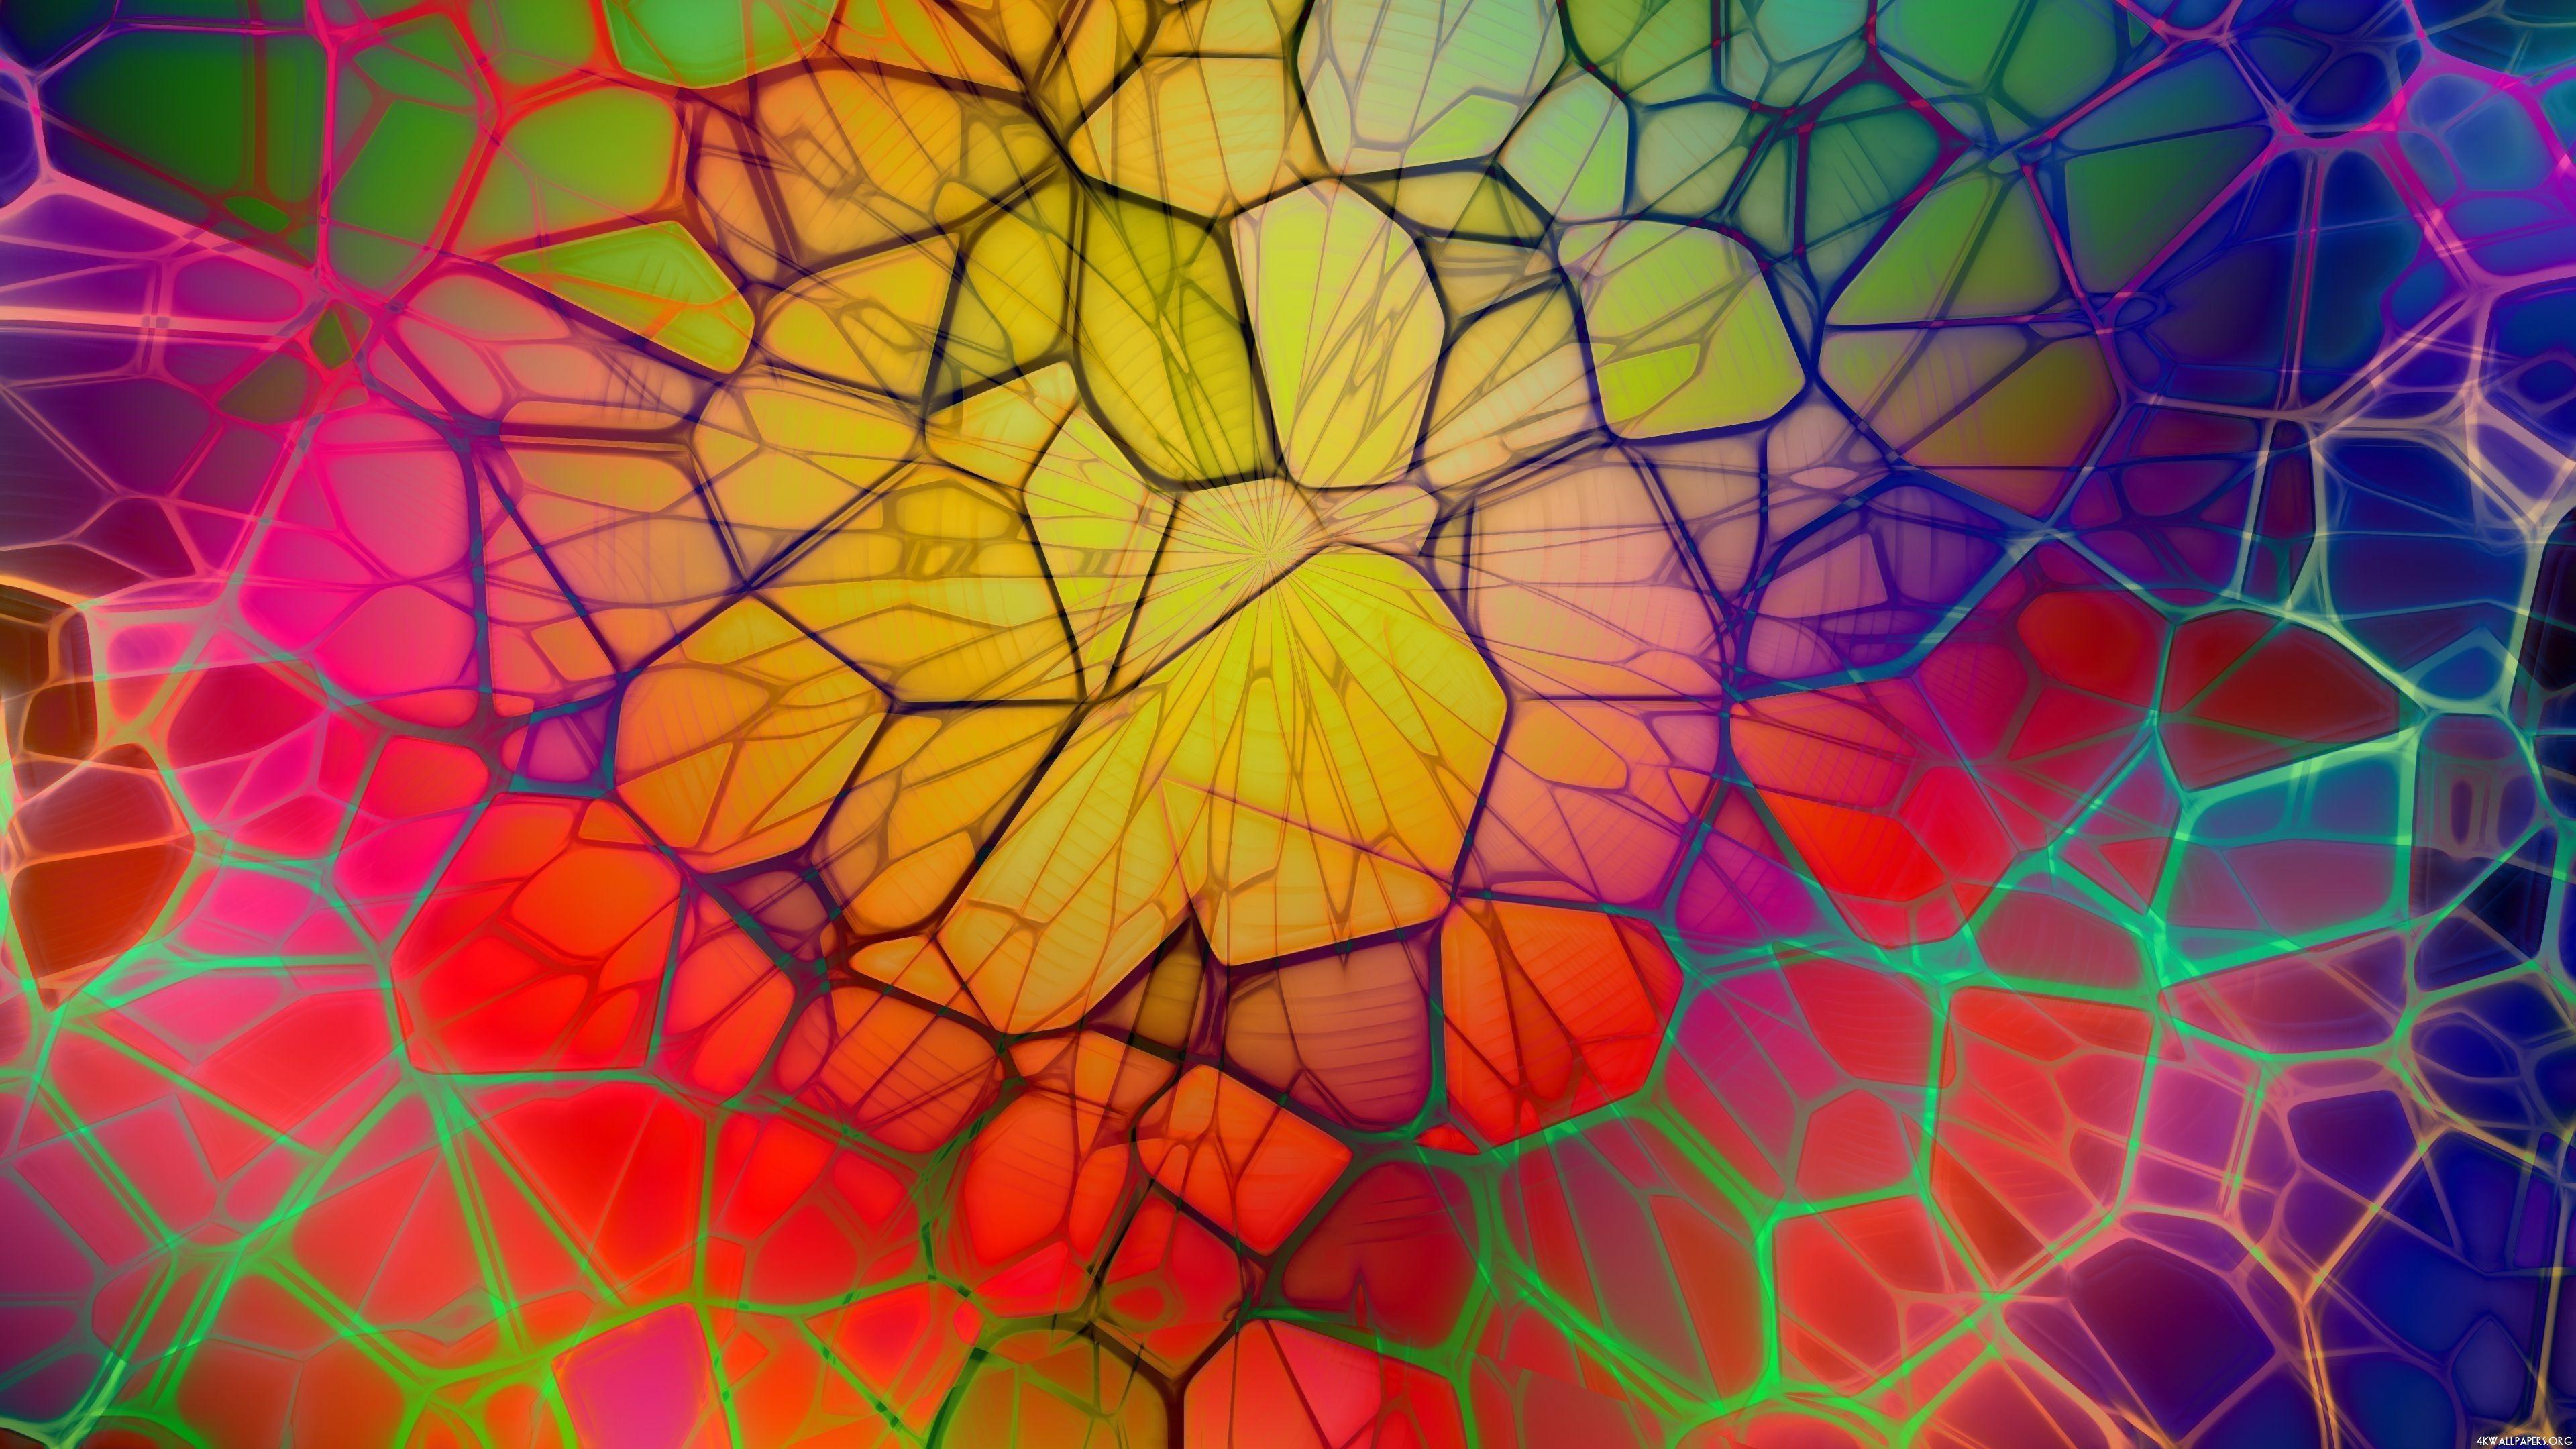 Abstract Colorful Web 4K Ultra HD Wallpaper 3840×2160